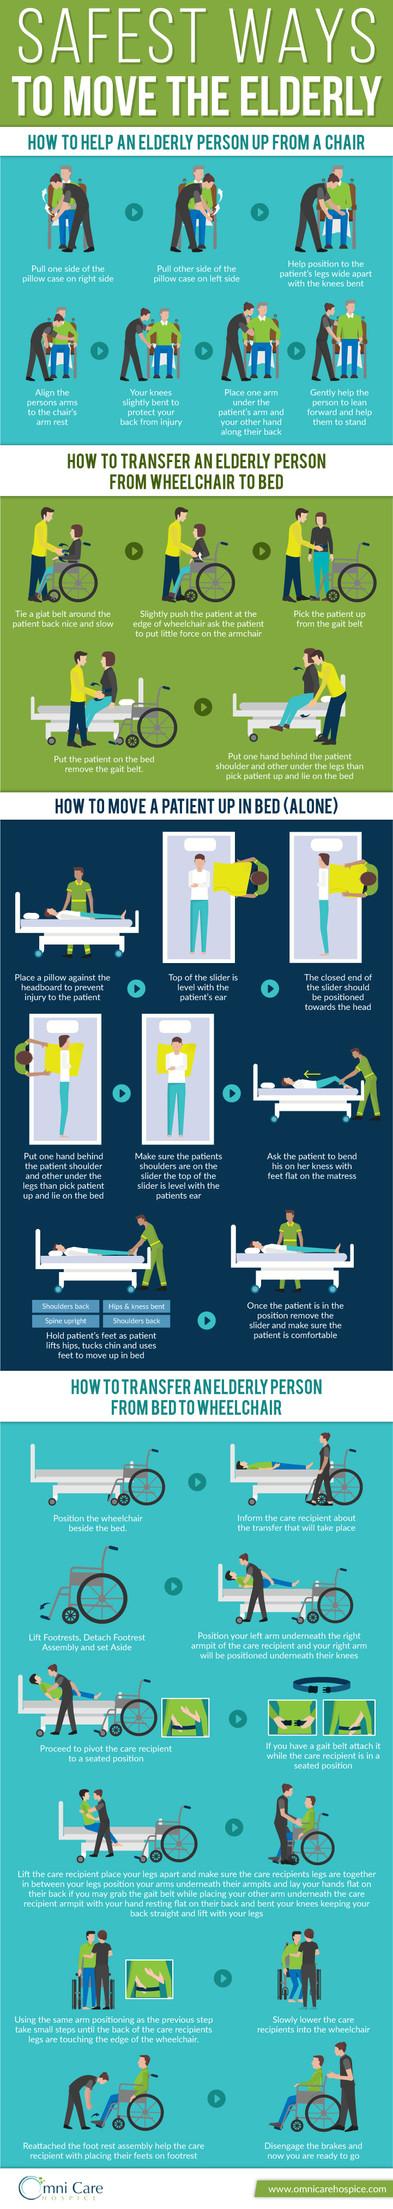 Safest Ways to Move the Elderly